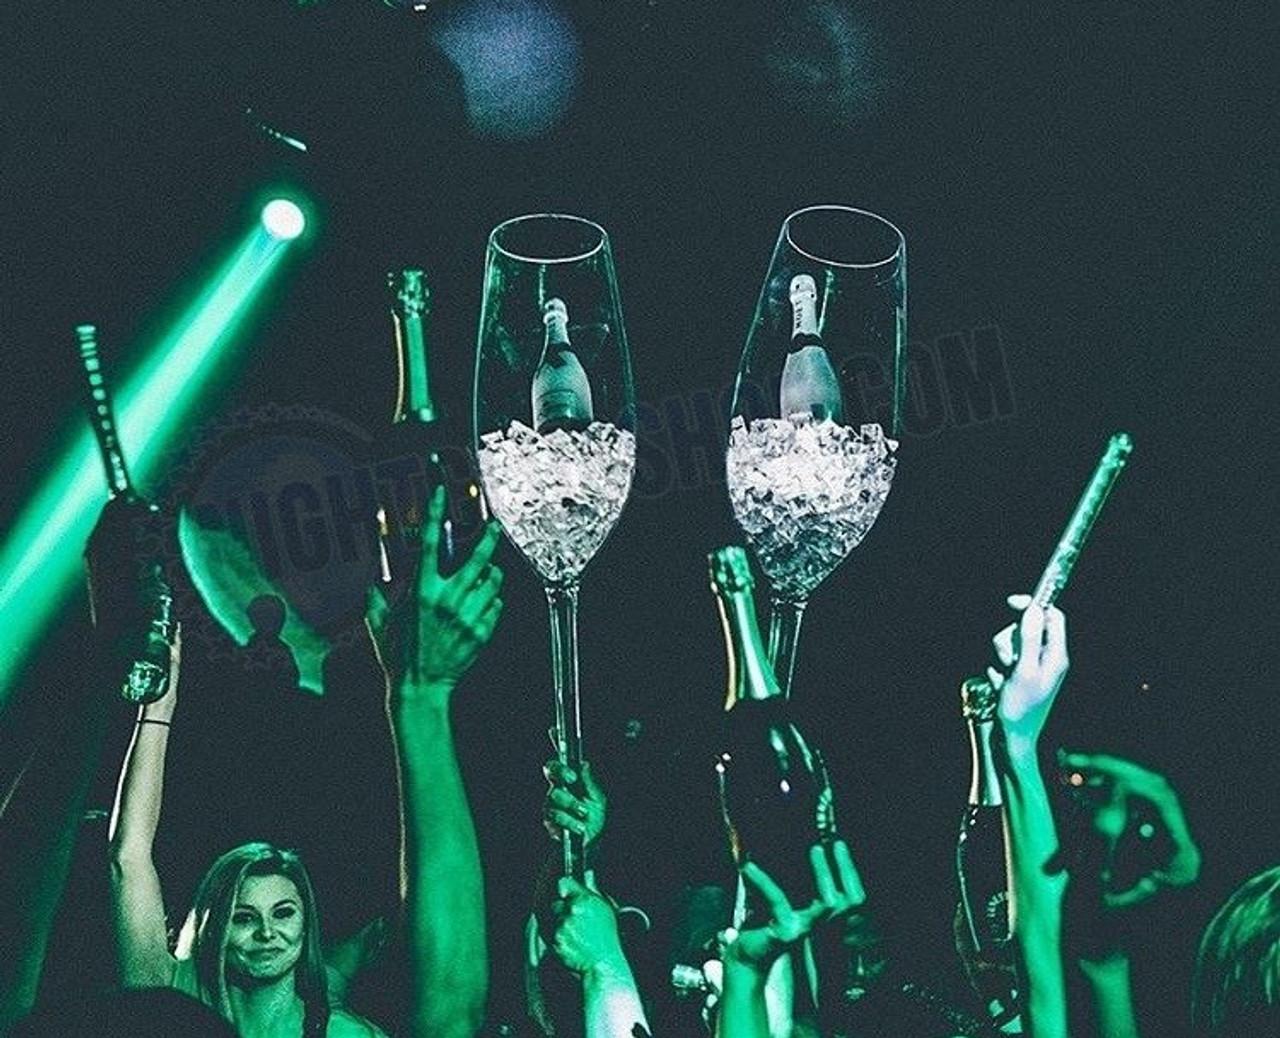 Champagne, Bottle, Presenter, Jumbo, Sparkling, Wine, Acrylic, Cups, Club, Casino, Wedding, Birthdays, VIP, Exclusive